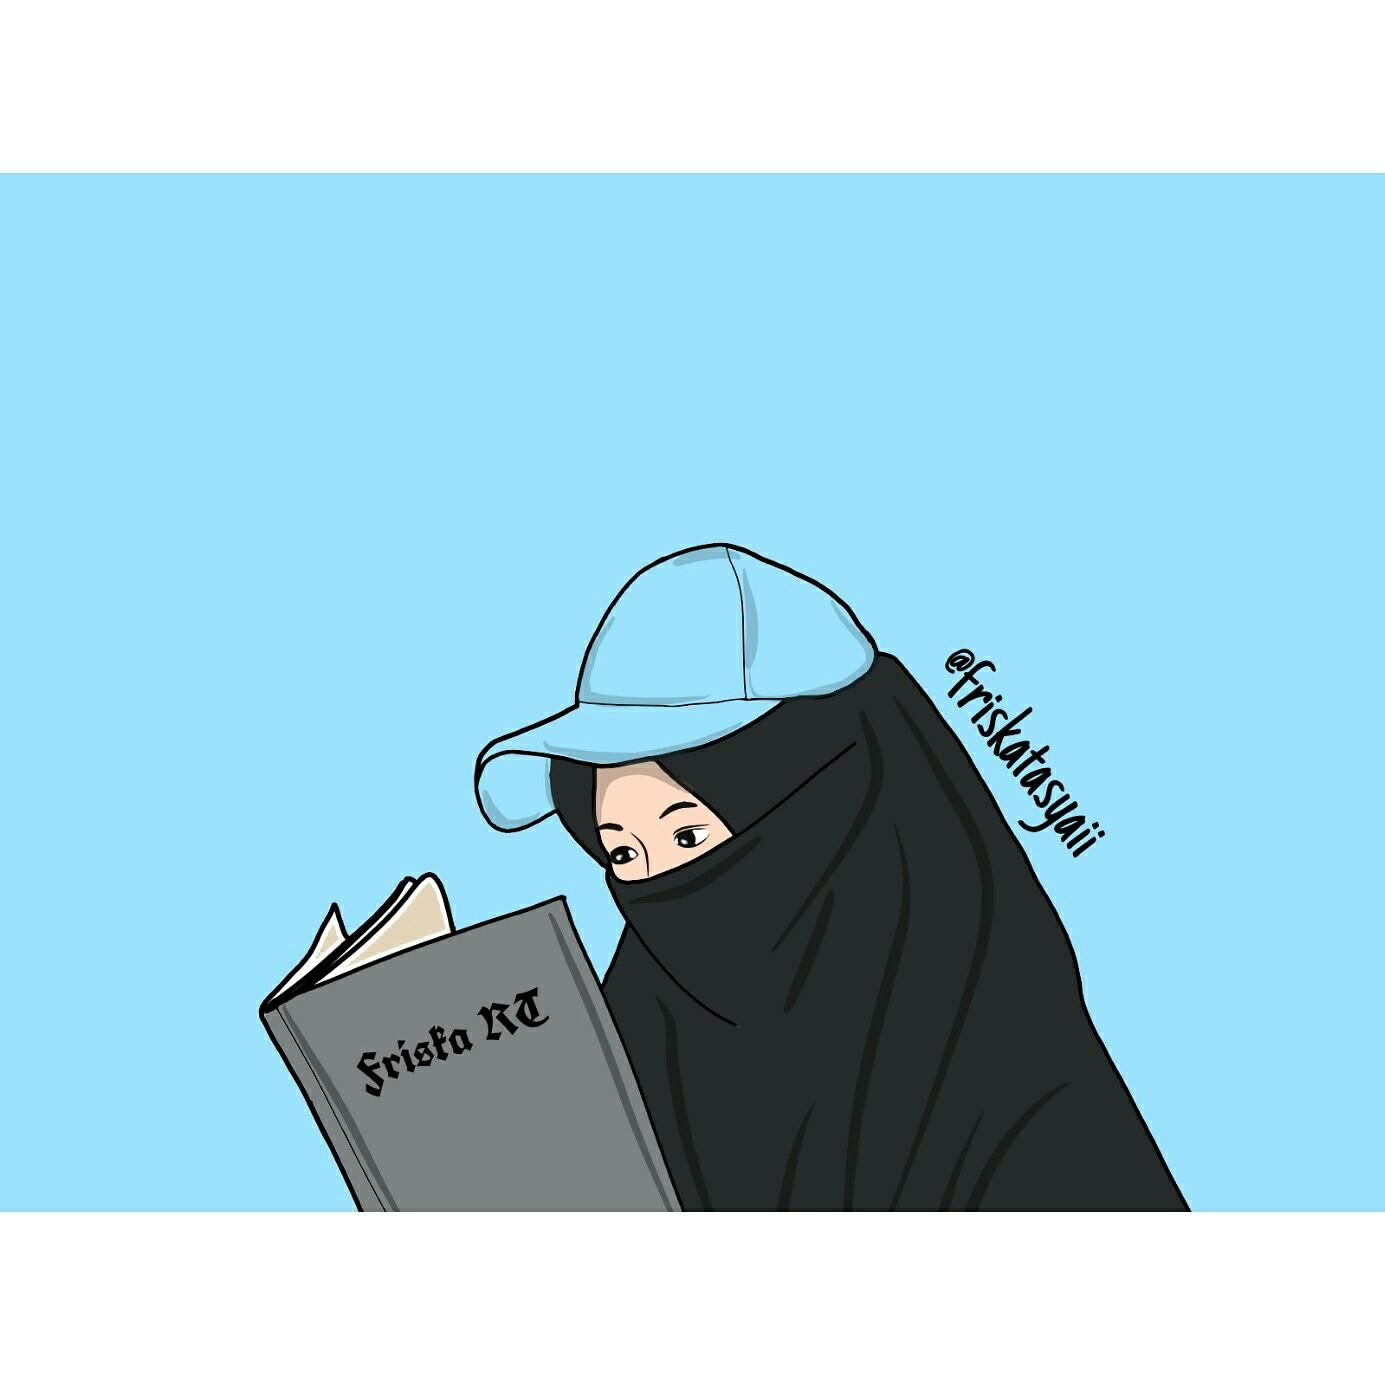 Animasi Hijab Bertopi Nusagates